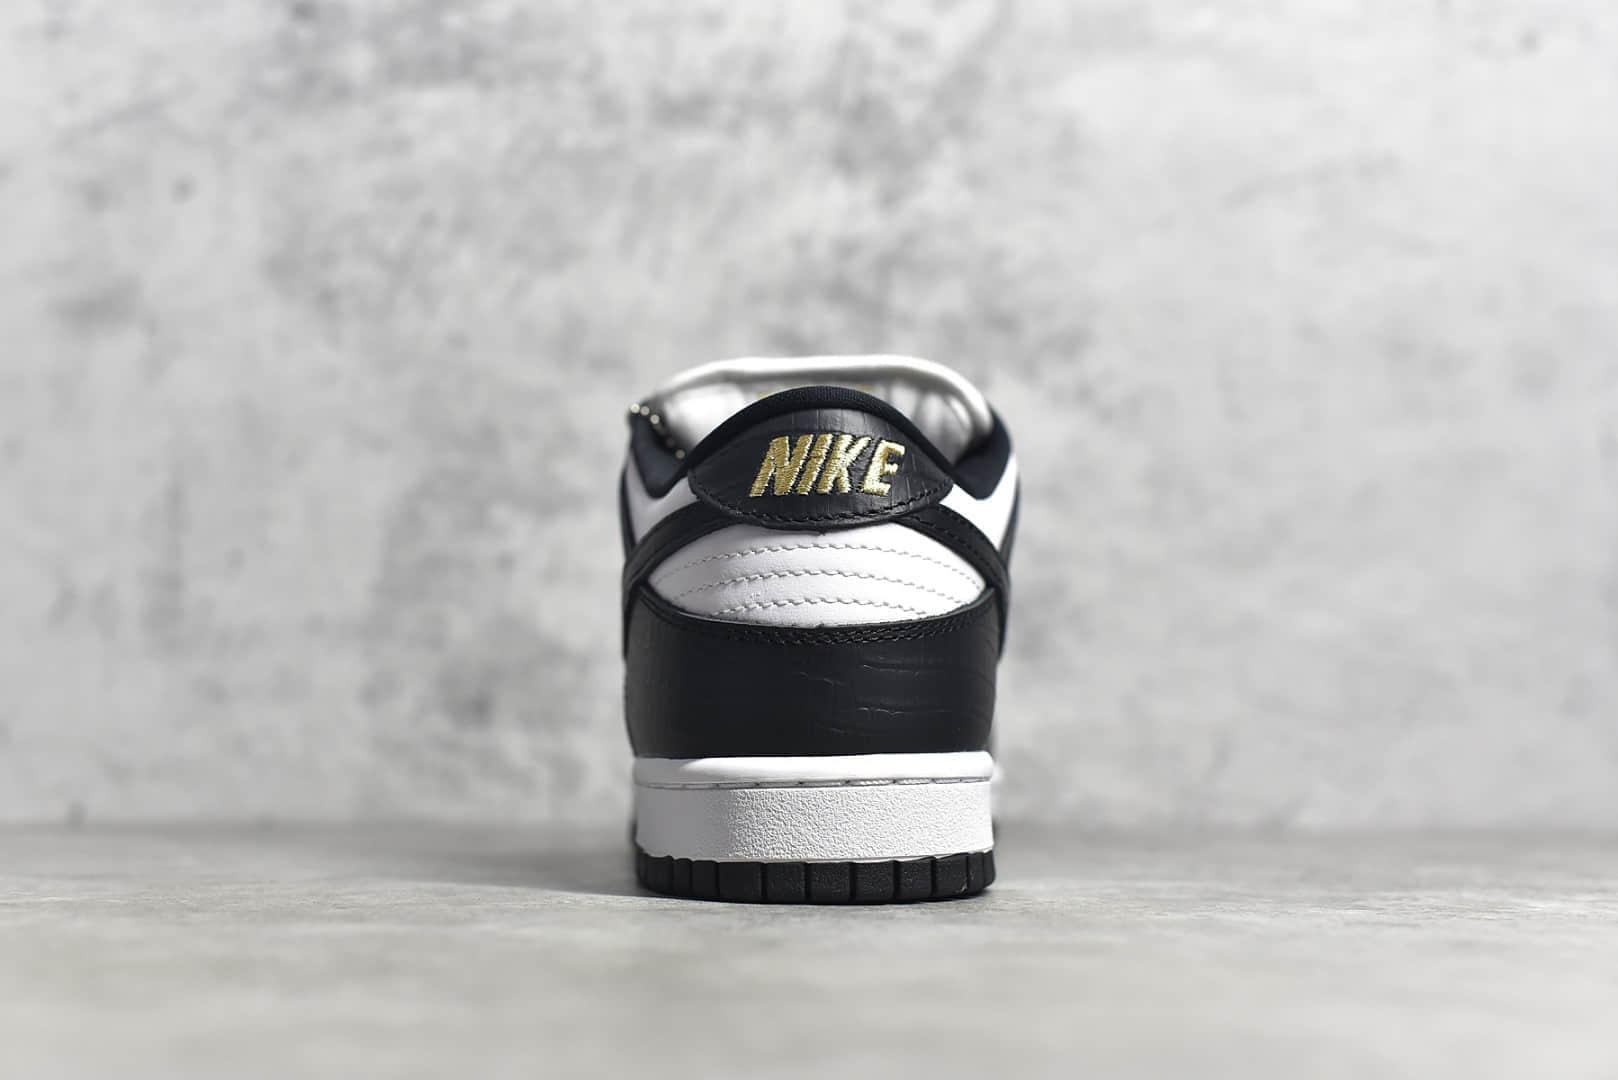 耐克Dunk SB SUP联名白金黑低帮 Supreme x Nike SB DunkLow